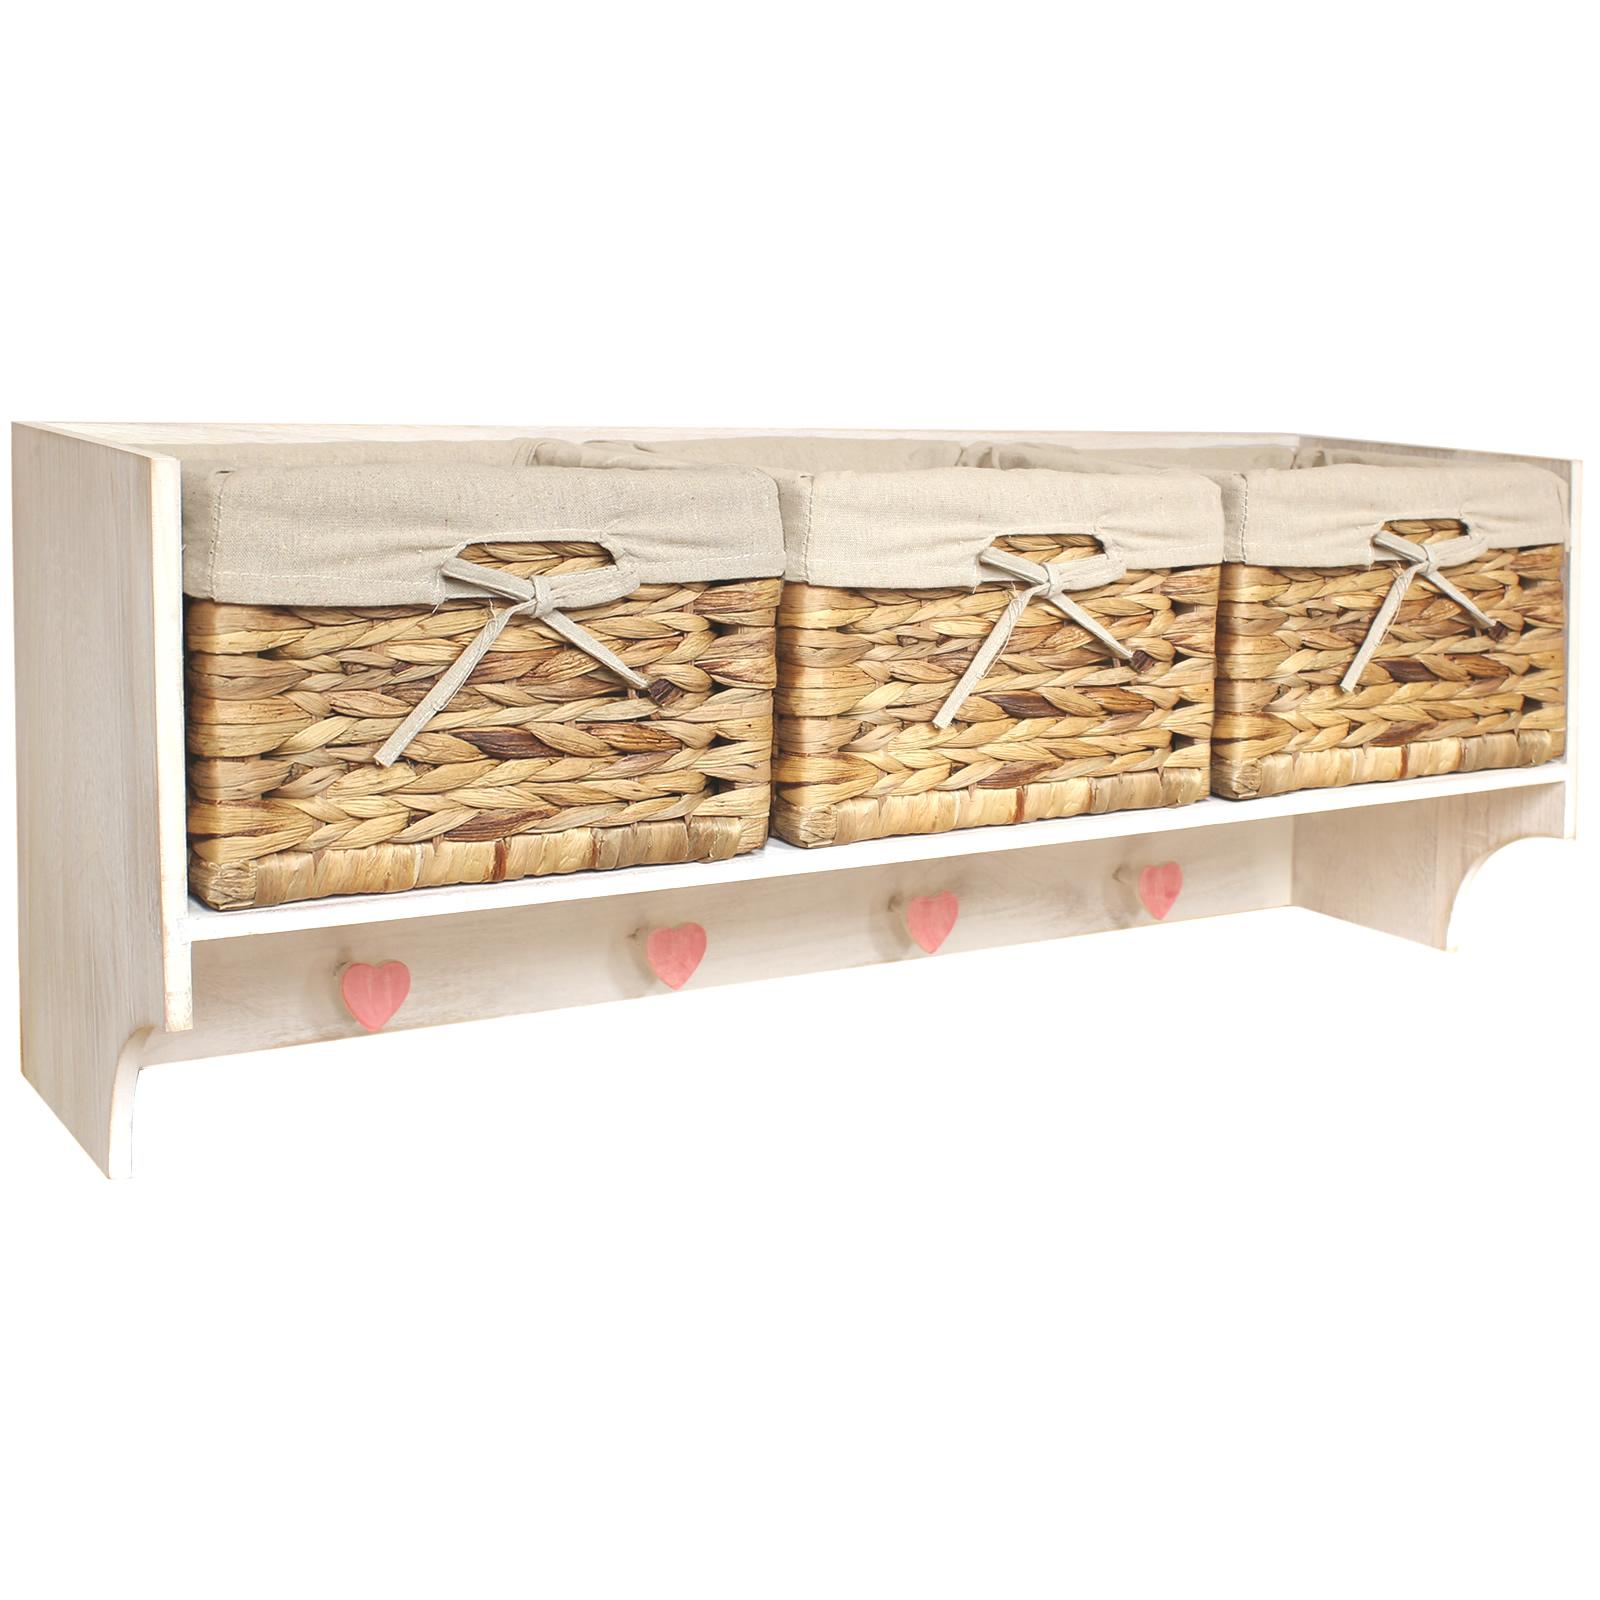 Hartleys Large Hallway Coat Hook Rack 3 Storage Baskets